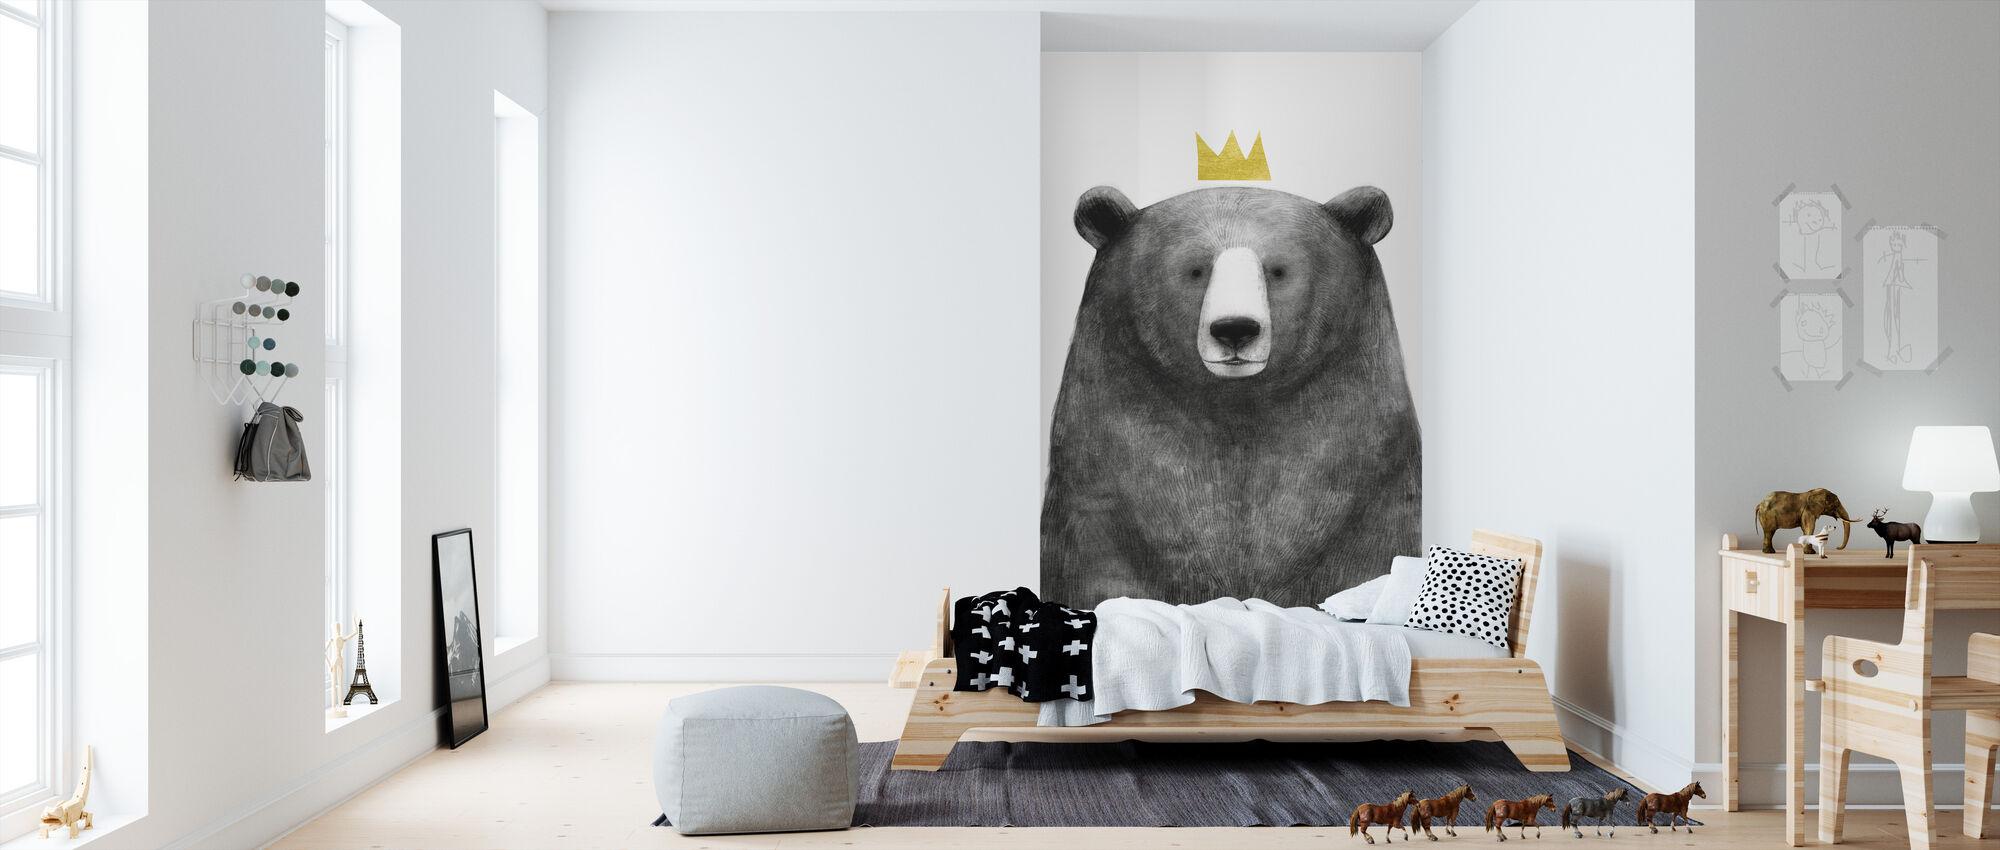 Royal Forester - Wallpaper - Kids Room